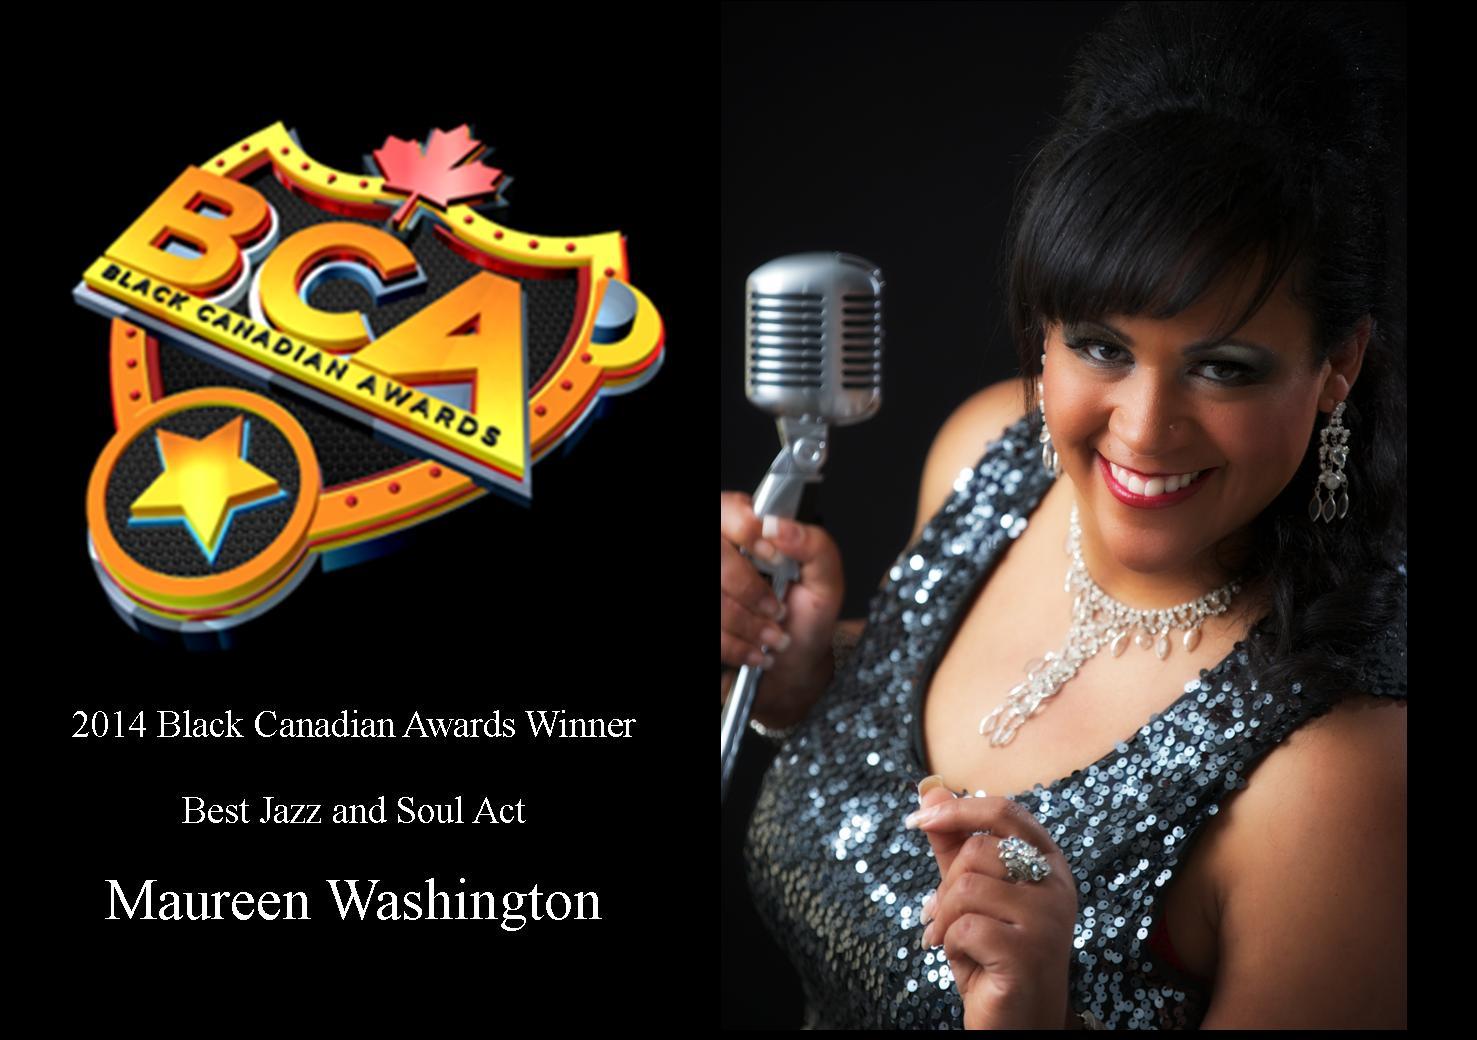 Black Canadian Award 2014